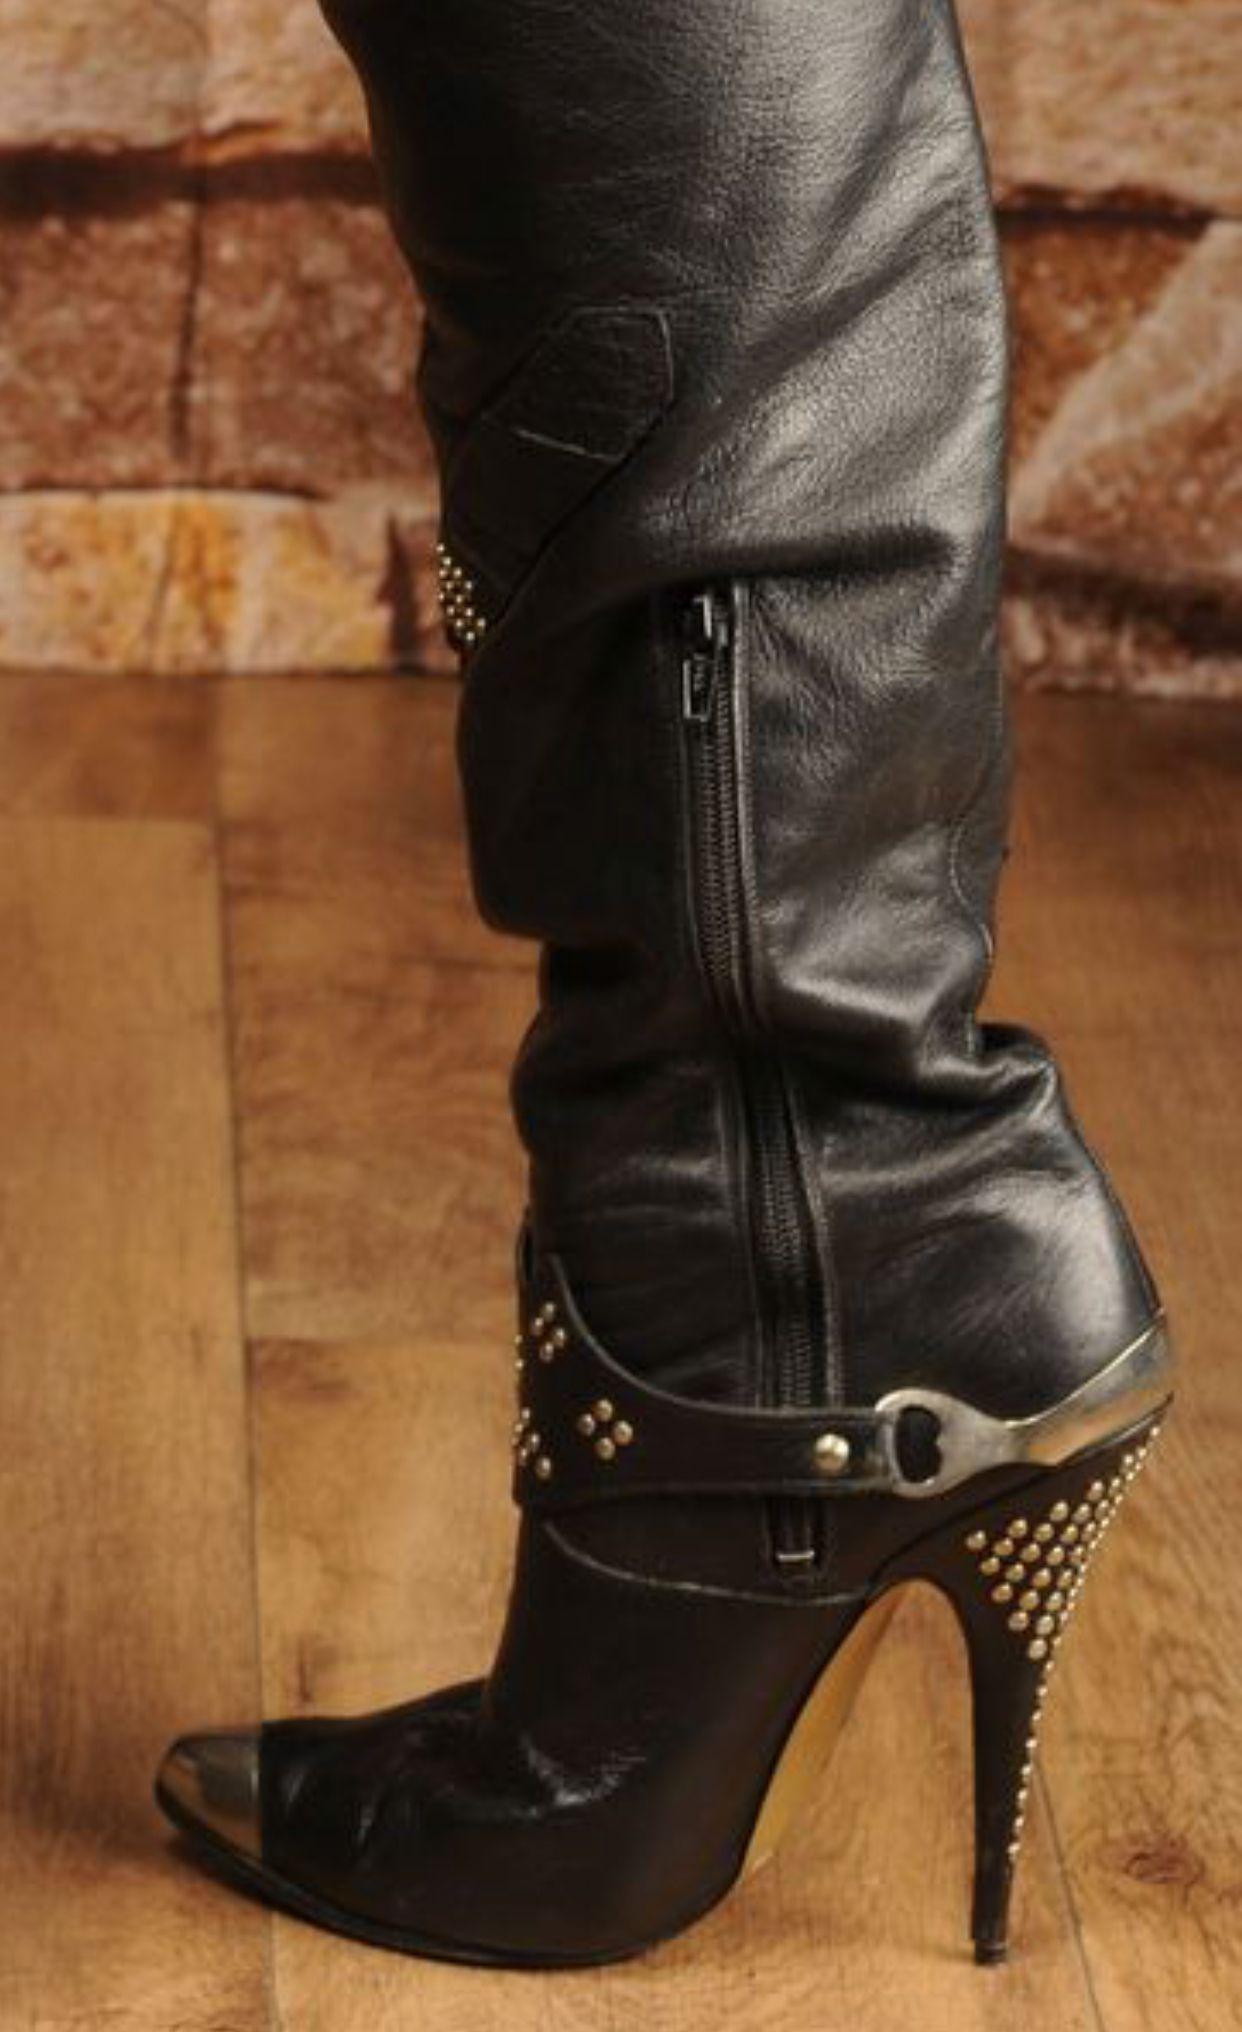 40a32fa8 80s style boots, #SavannahJames #rock #Retro80s | Mistress | Shoes ...